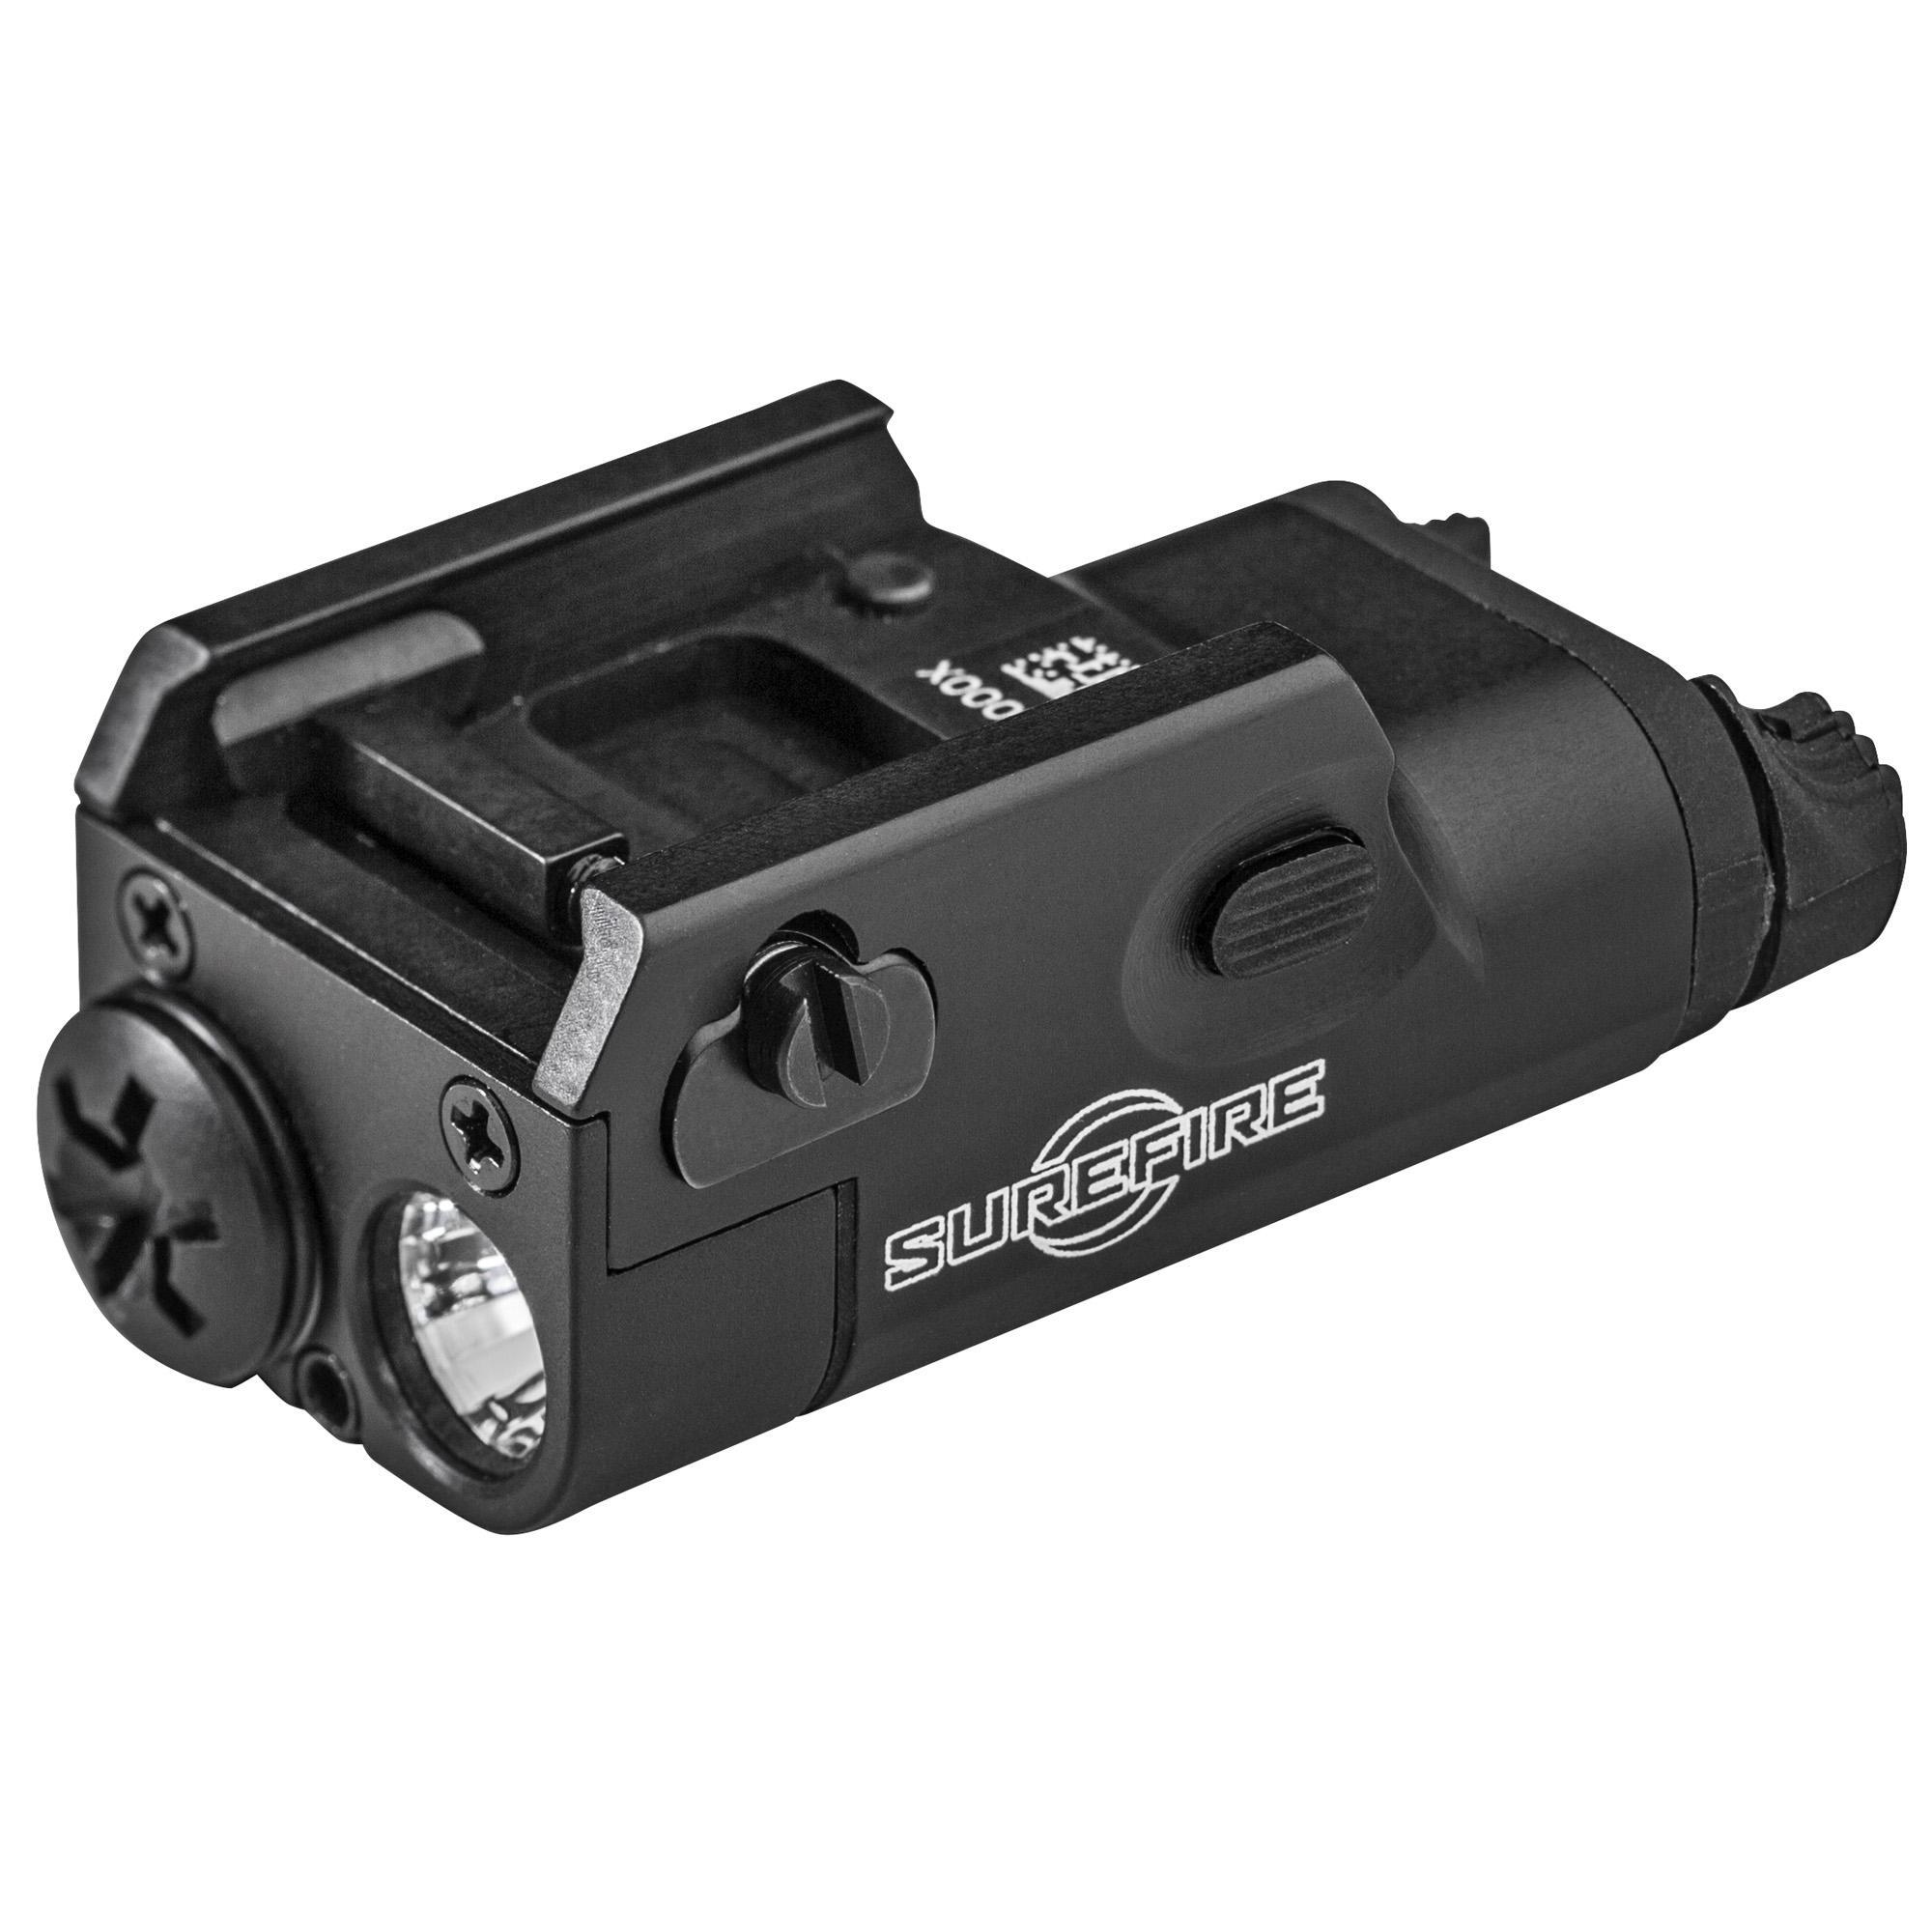 Surefire Surefire Xc1 Cmp Pistol Light 300lum